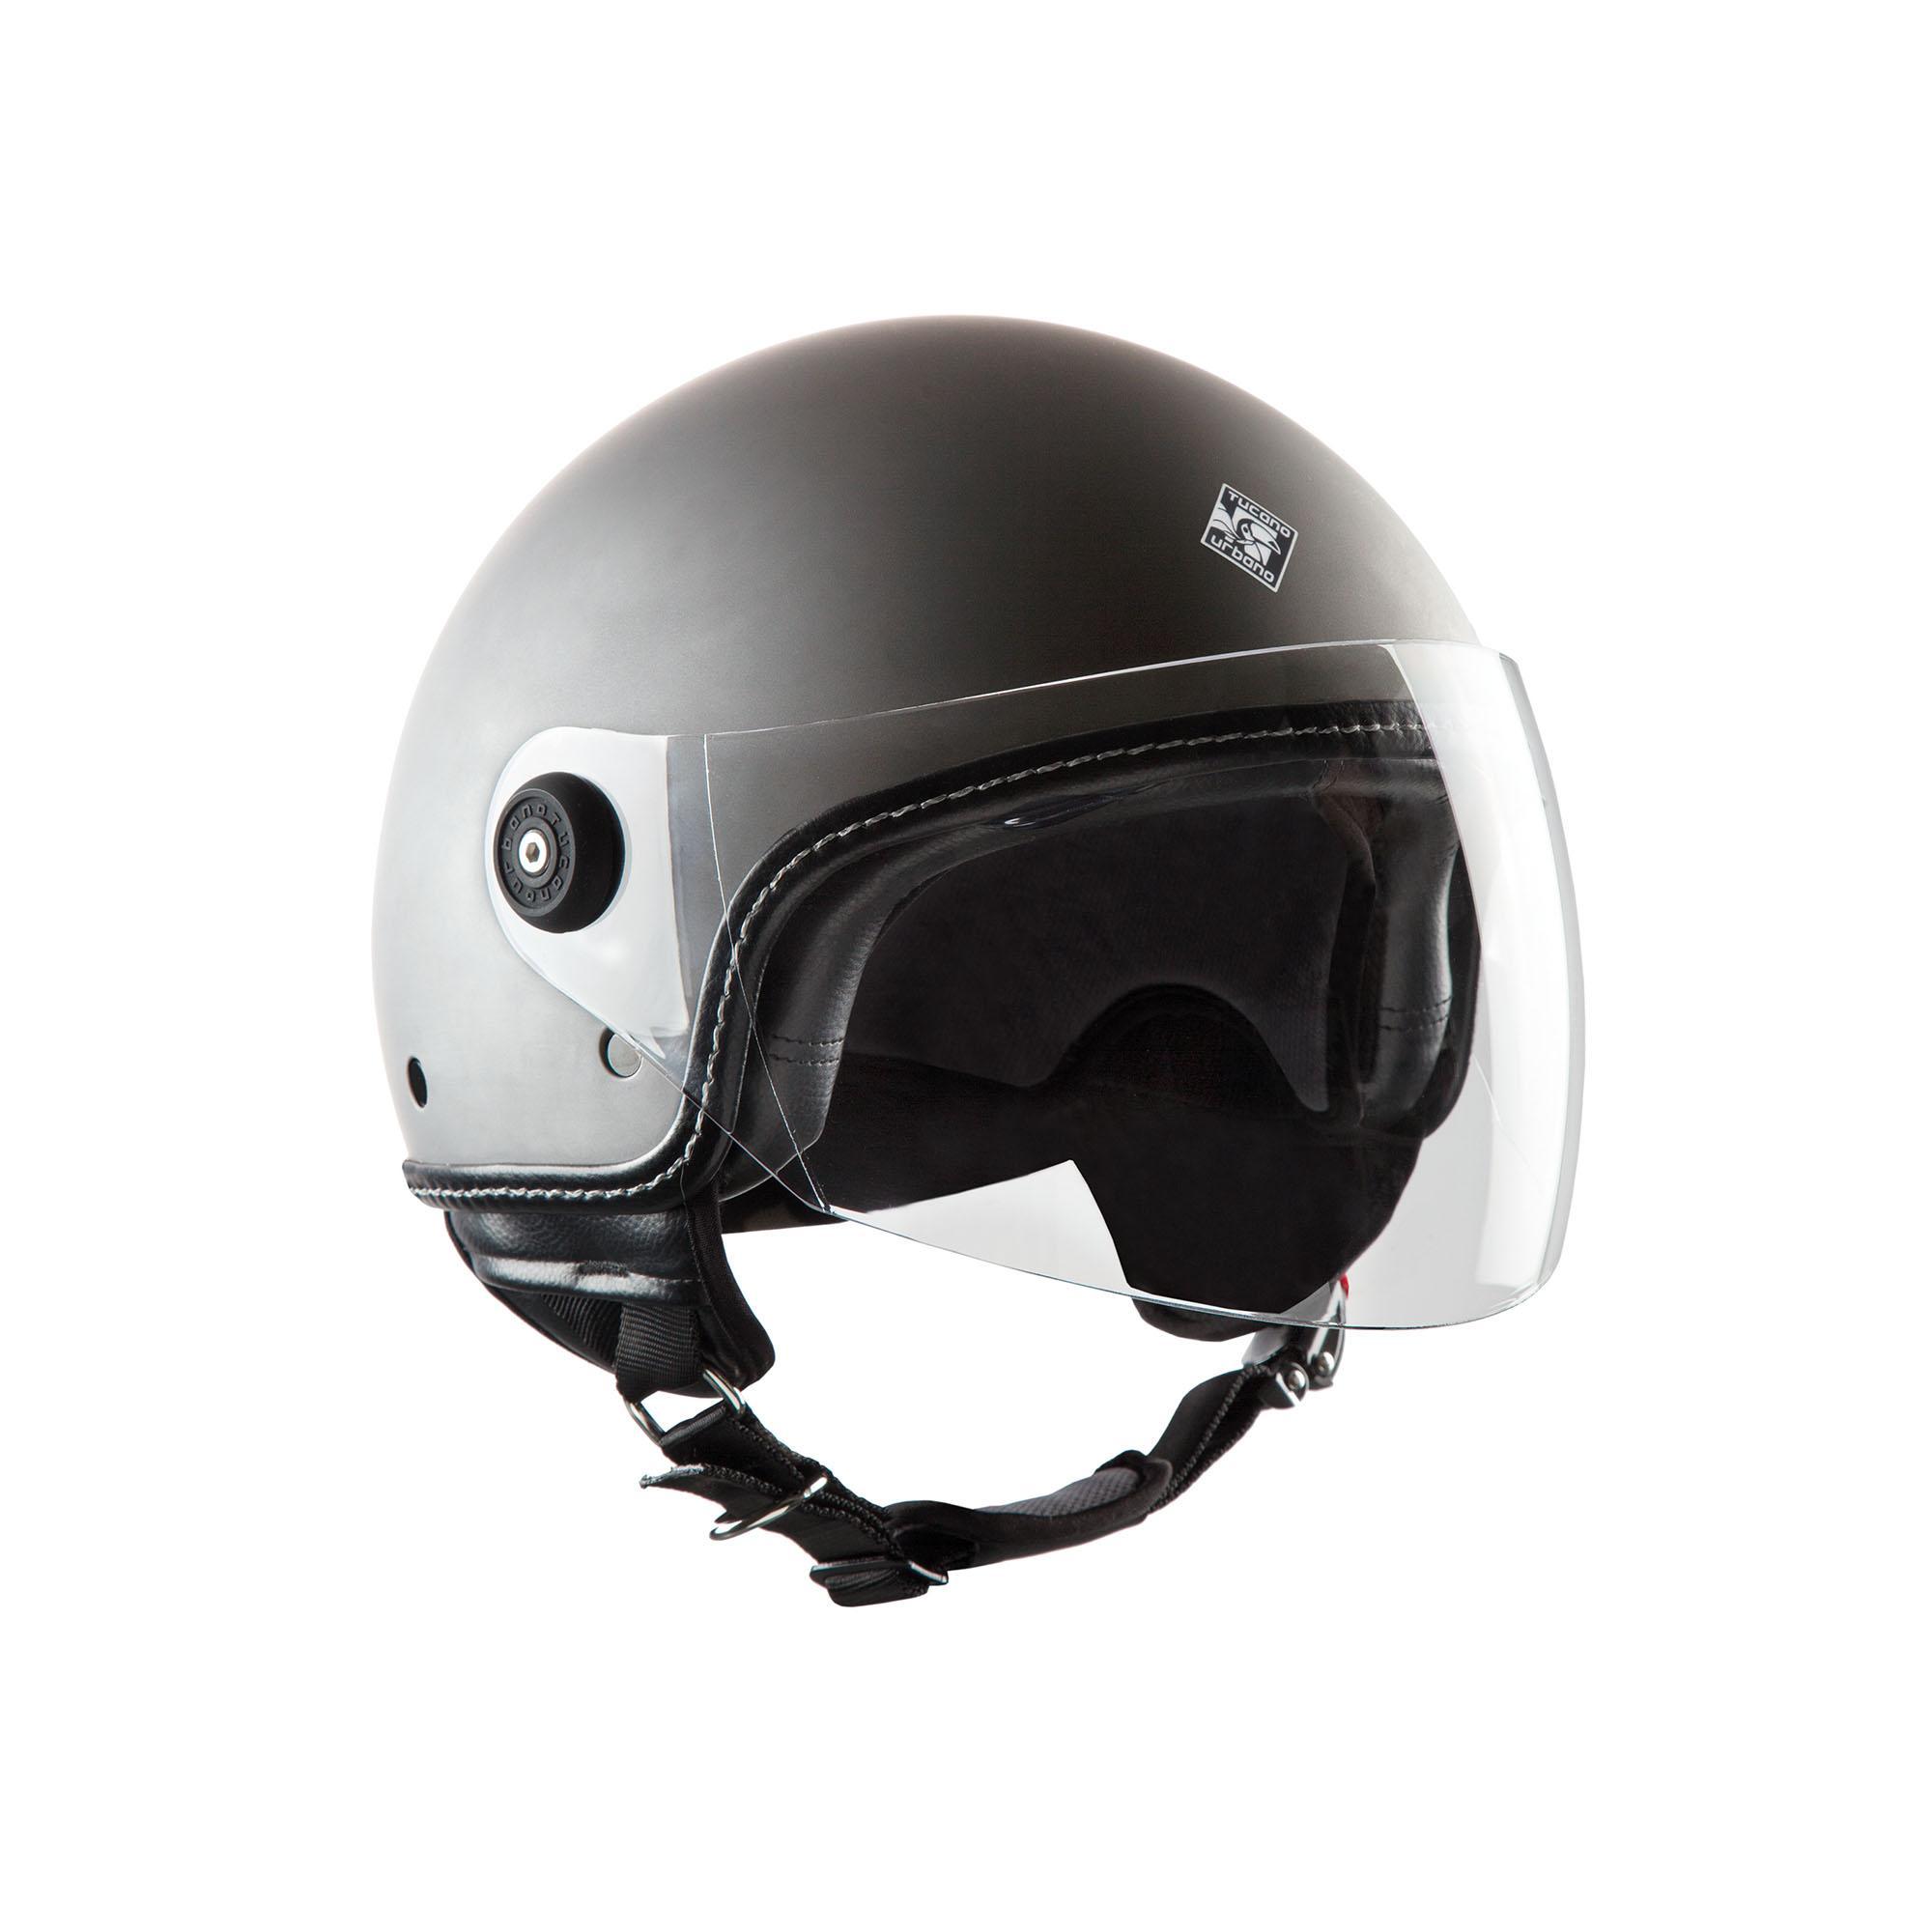 Demi–jet Helmet El'mettin 100% Polymer – Inner: 100% Polystyrene – Lining: 100% Polyester